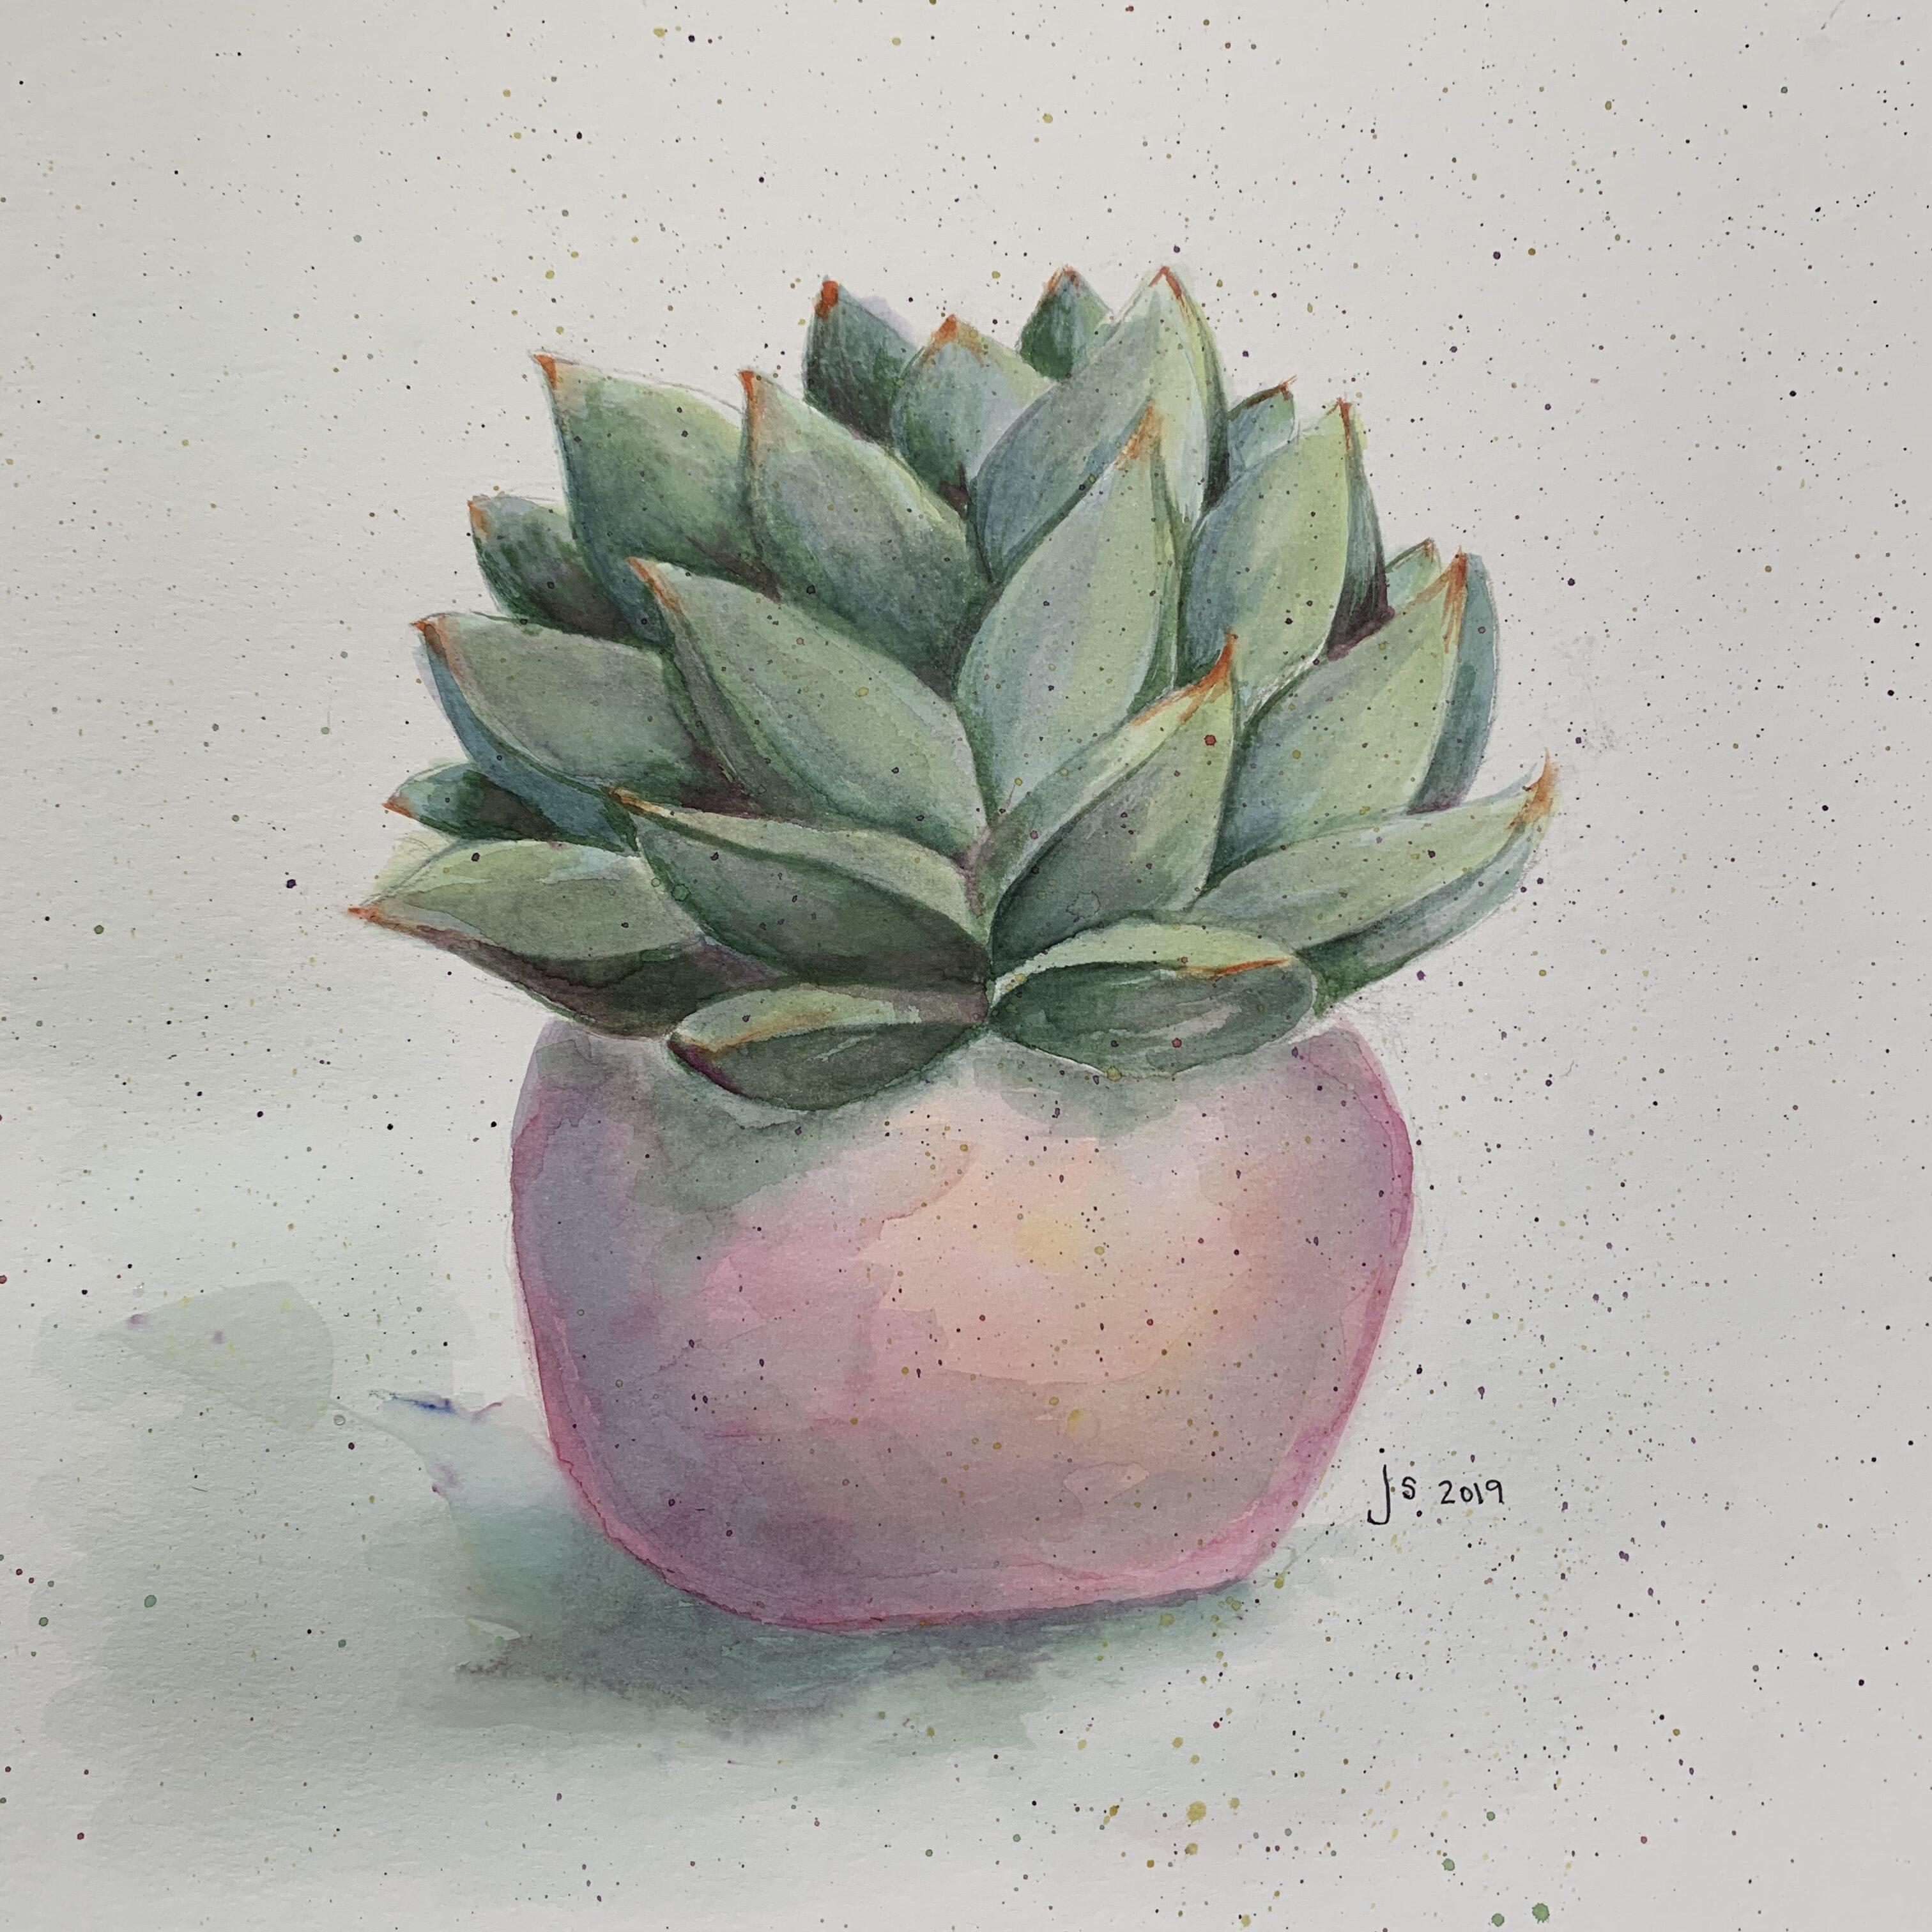 241B87EE 5681 4116 8A46 CDCE2C290020 Succulent in a pink pot